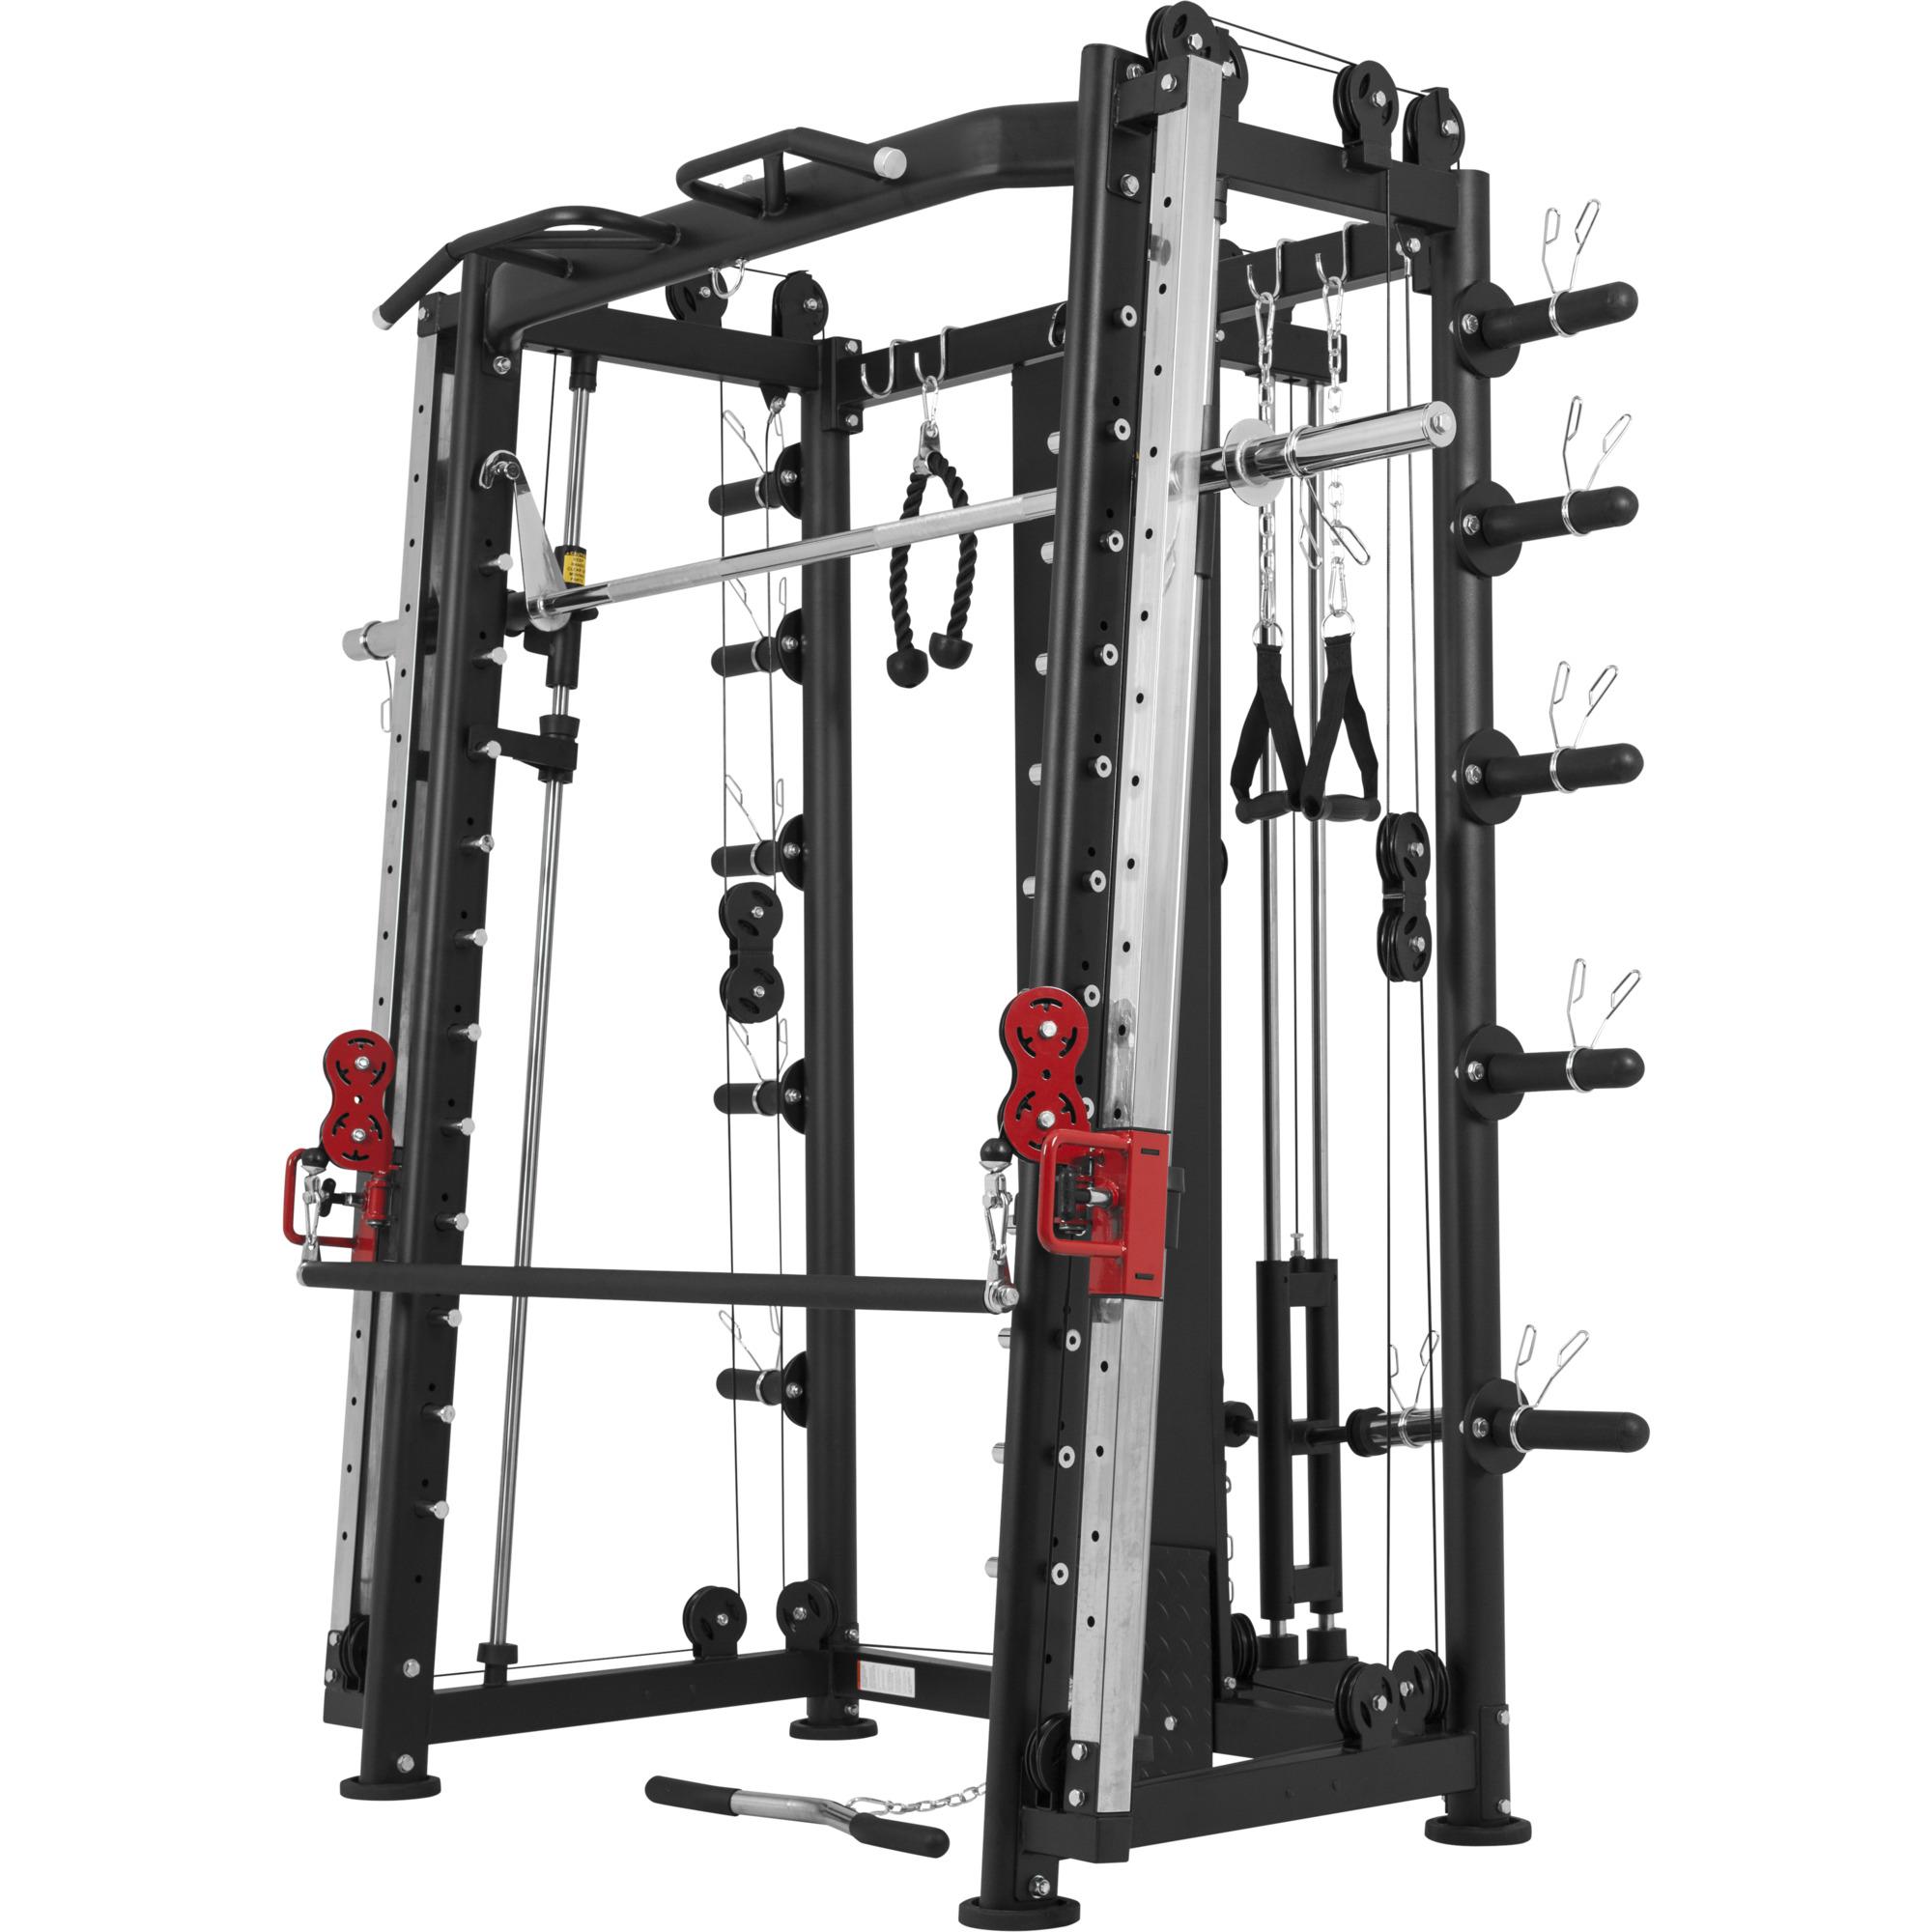 smith machine machine gorilla sports avec power rack multi station et presse 10000822. Black Bedroom Furniture Sets. Home Design Ideas